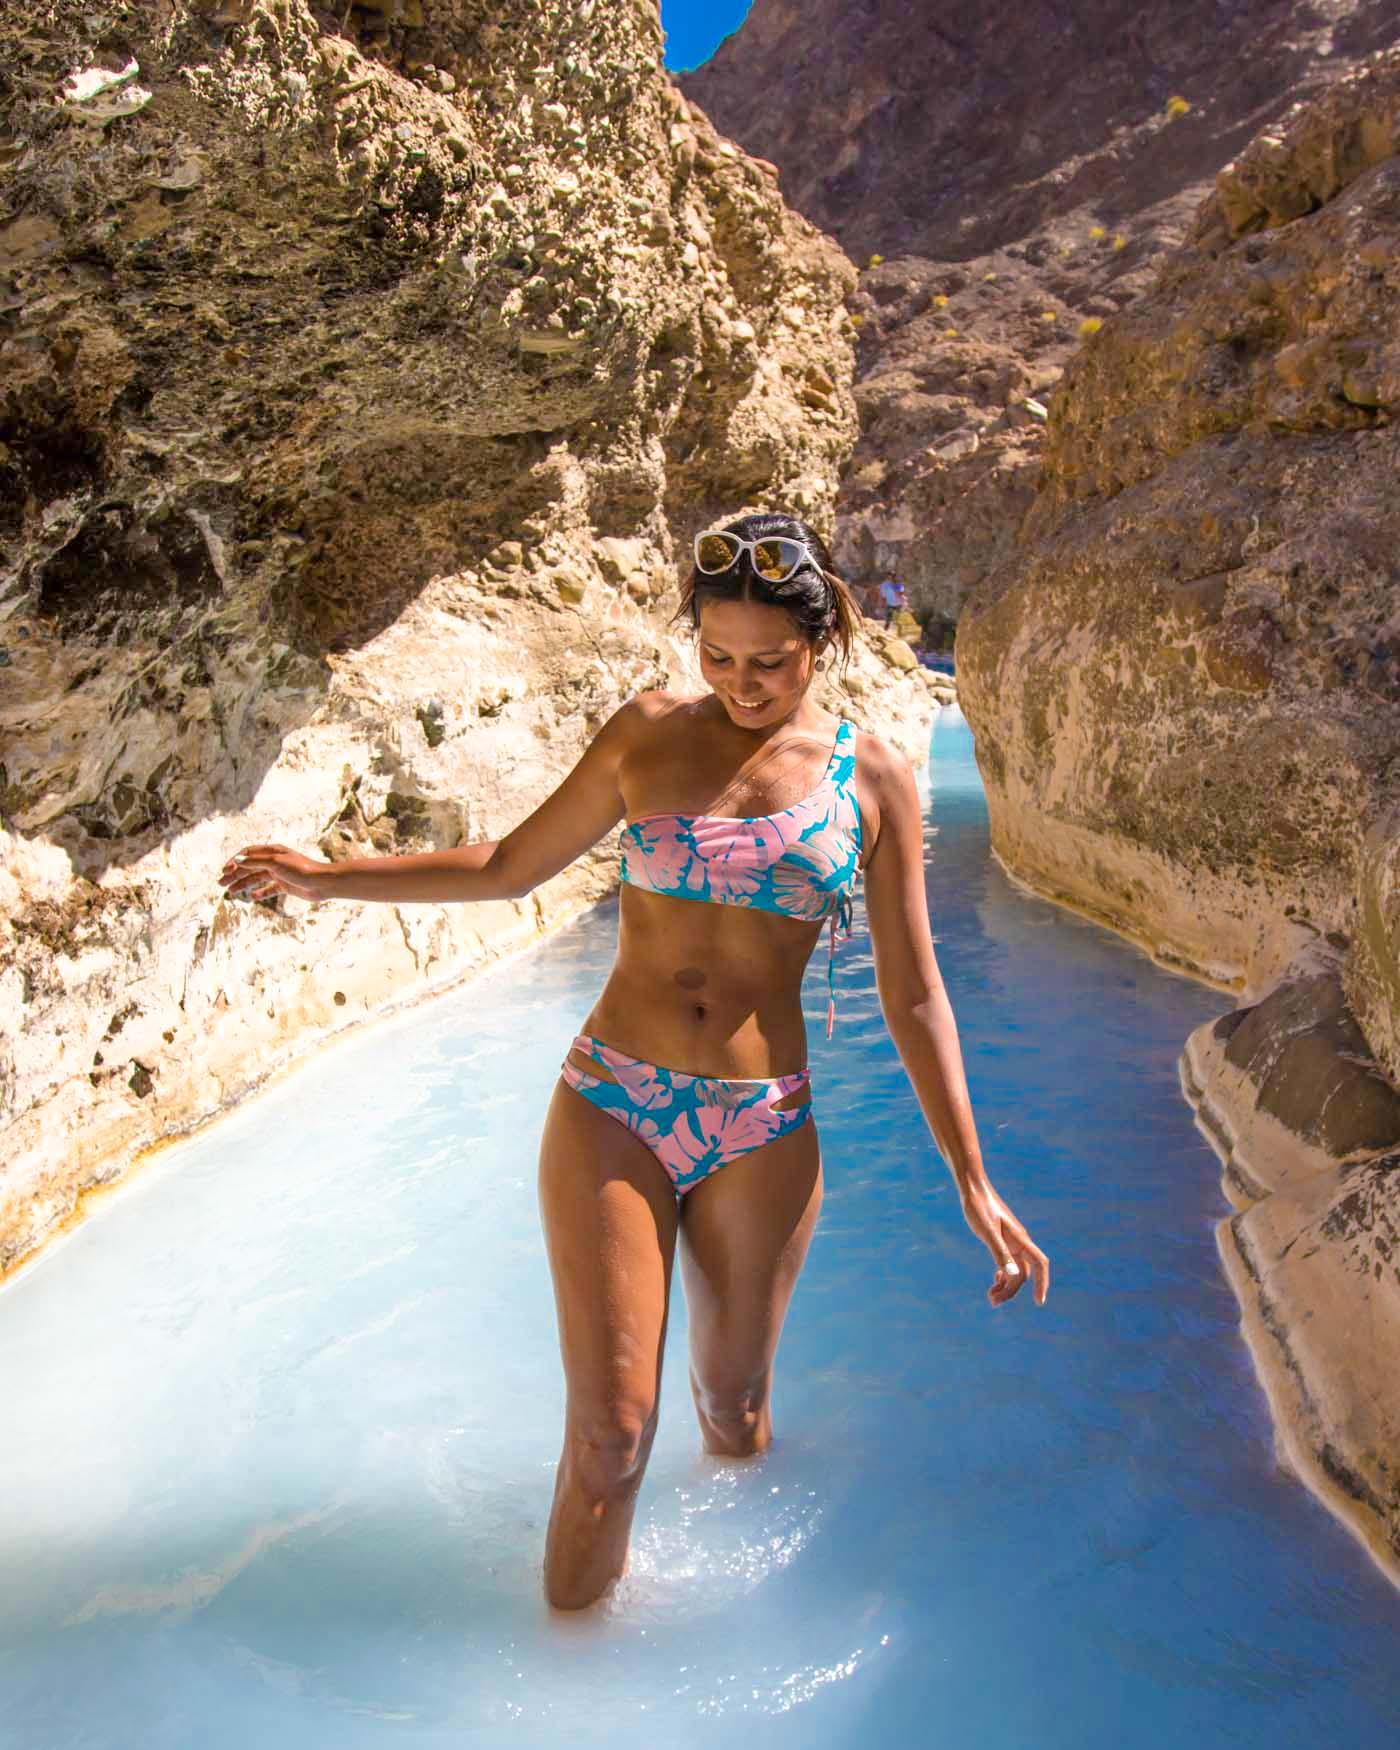 Oman_Muscat_Bimmah_Sinkhole_Road_Trip_Sinkhole_Natural_Pools_Wadis_Shab_Solo_Travel__Ain AlBatinah_Sulphur_Springs_Sahiban